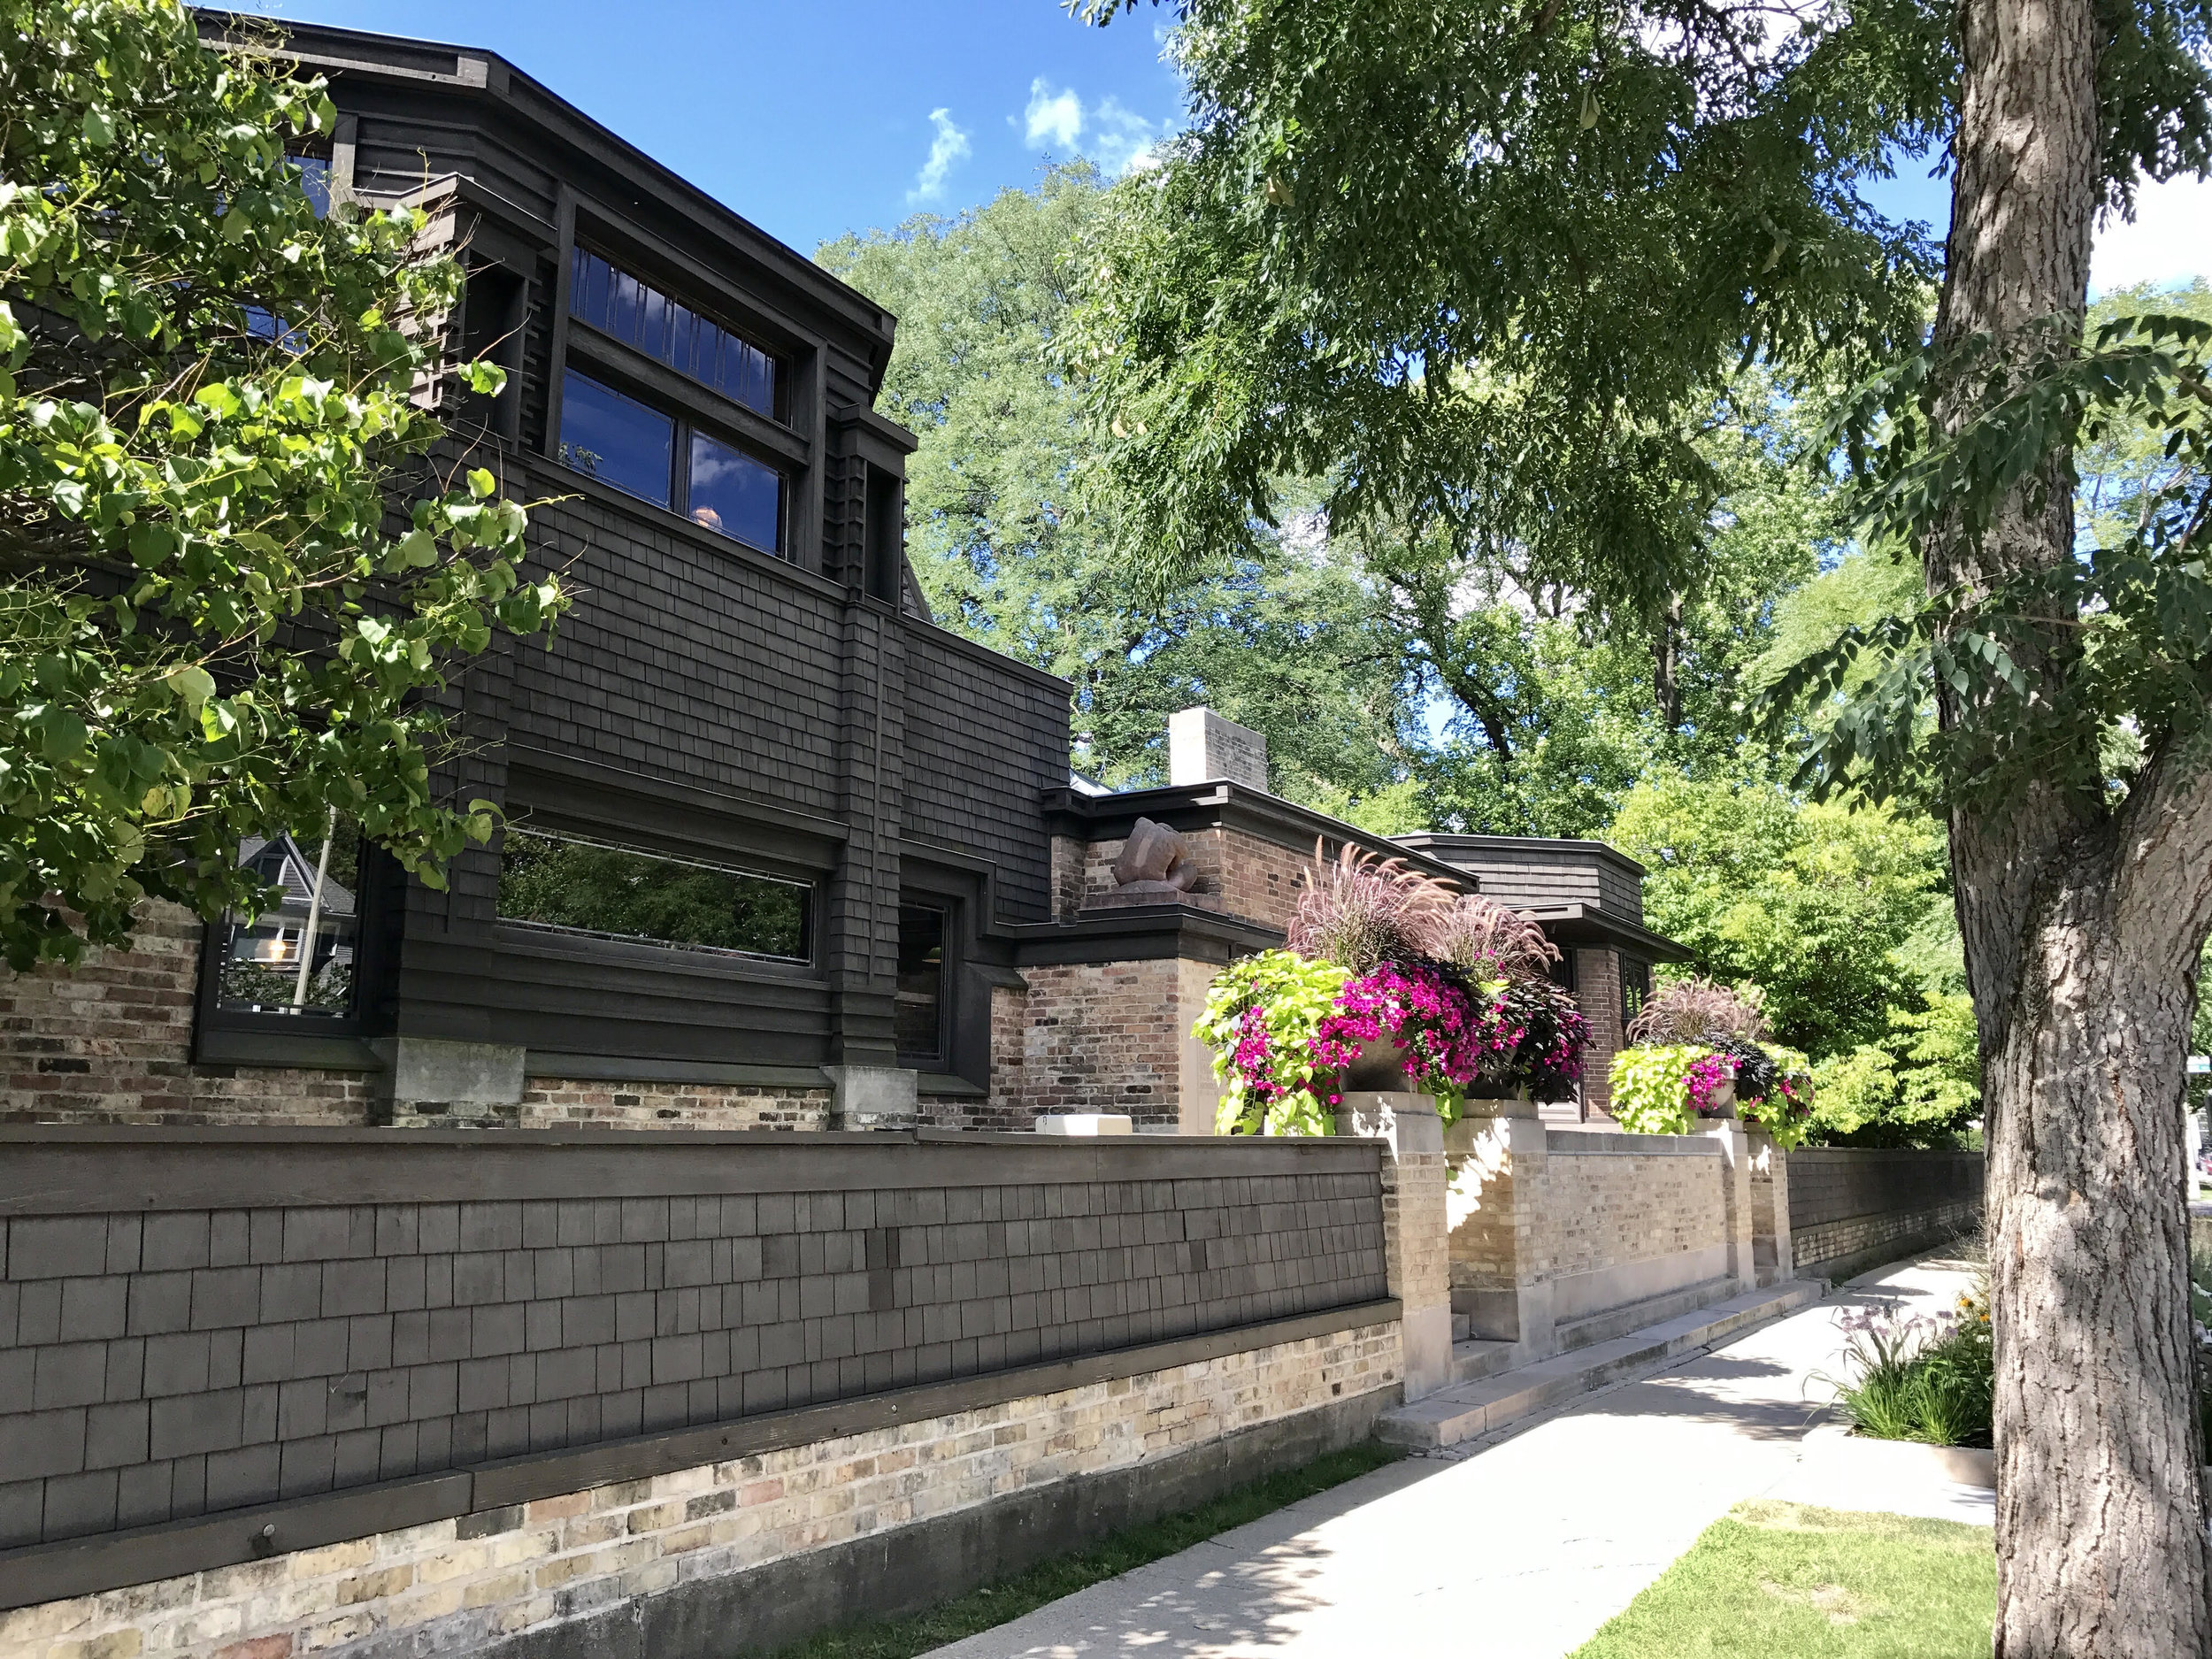 Frank Lloyd Wright's studio in Oak Park, IL